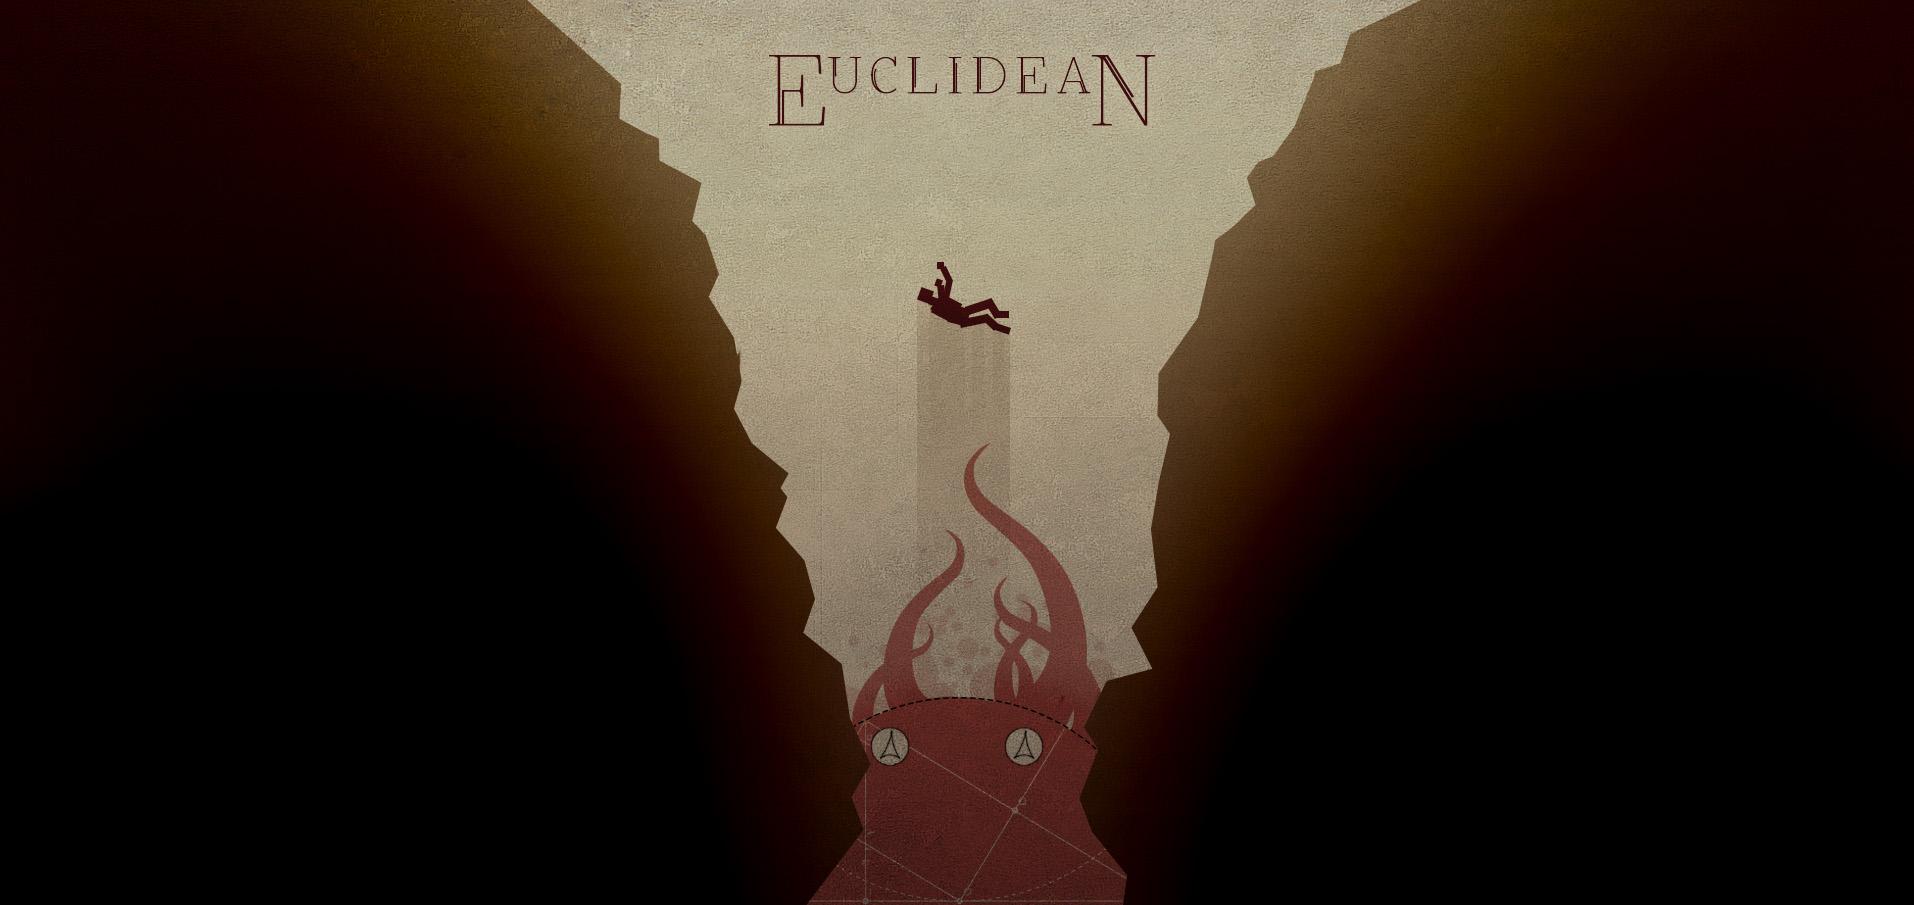 external image EuclideanHeaderFull.jpg